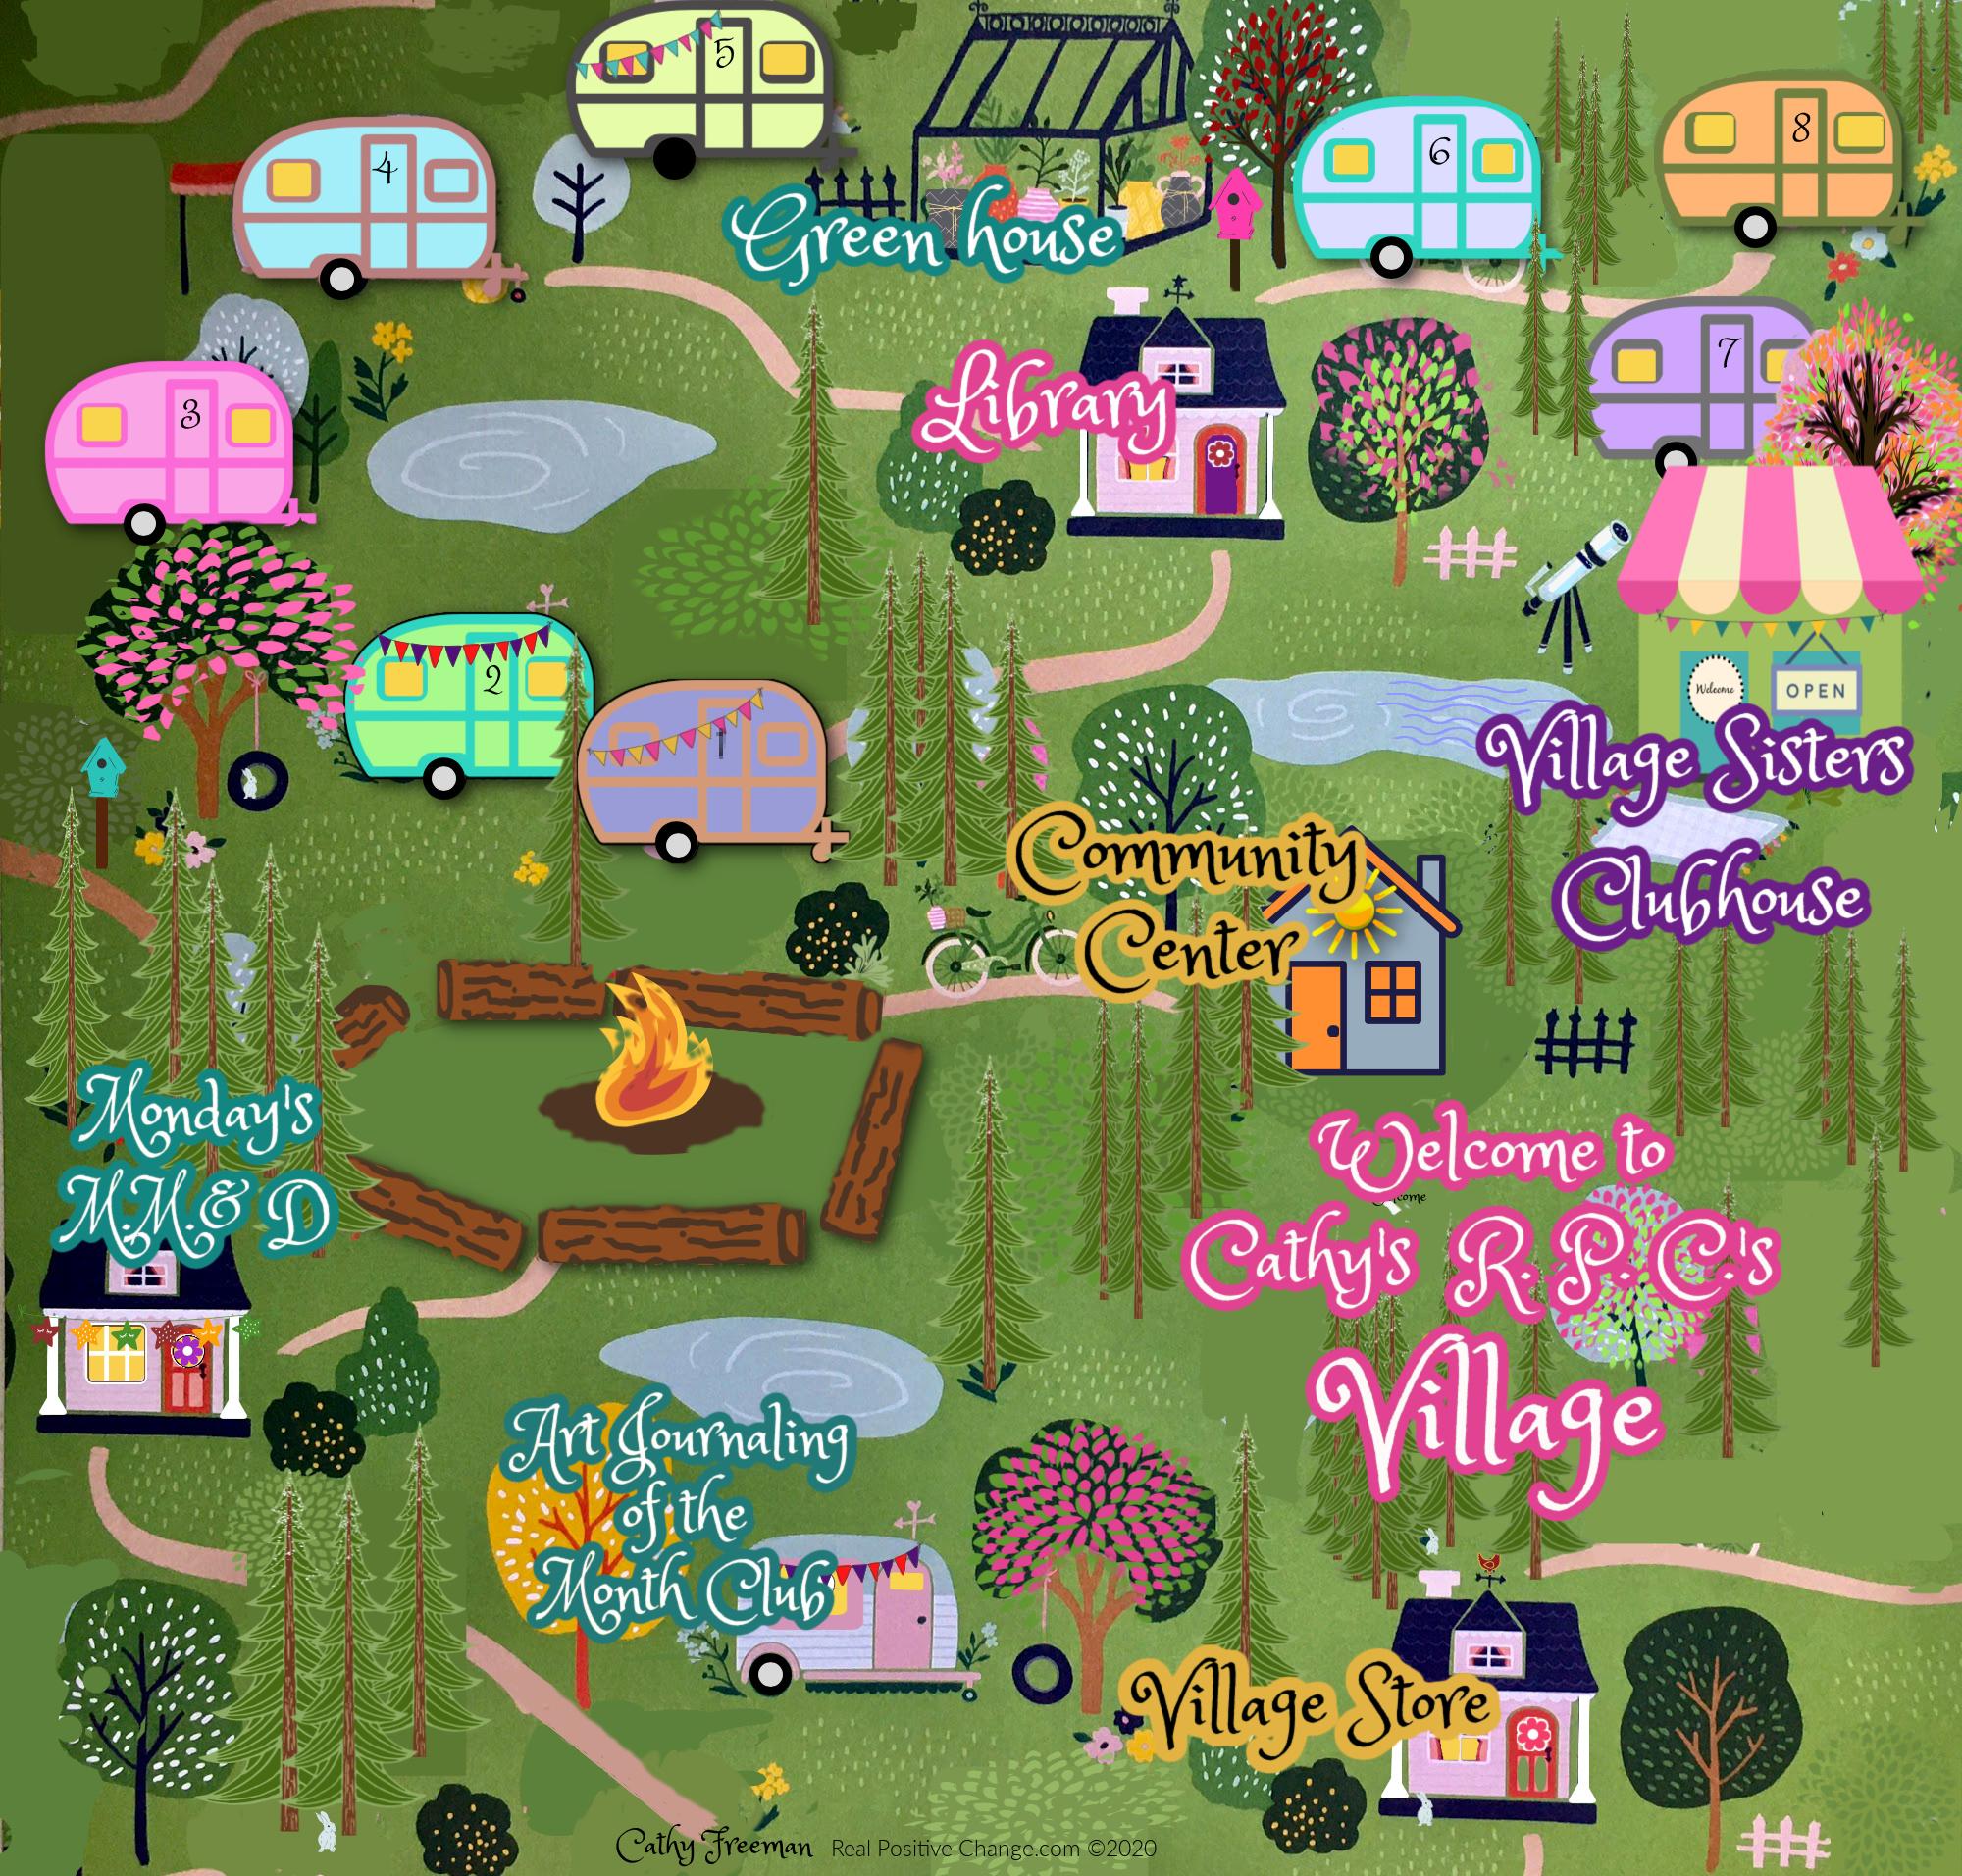 Cathy's Village